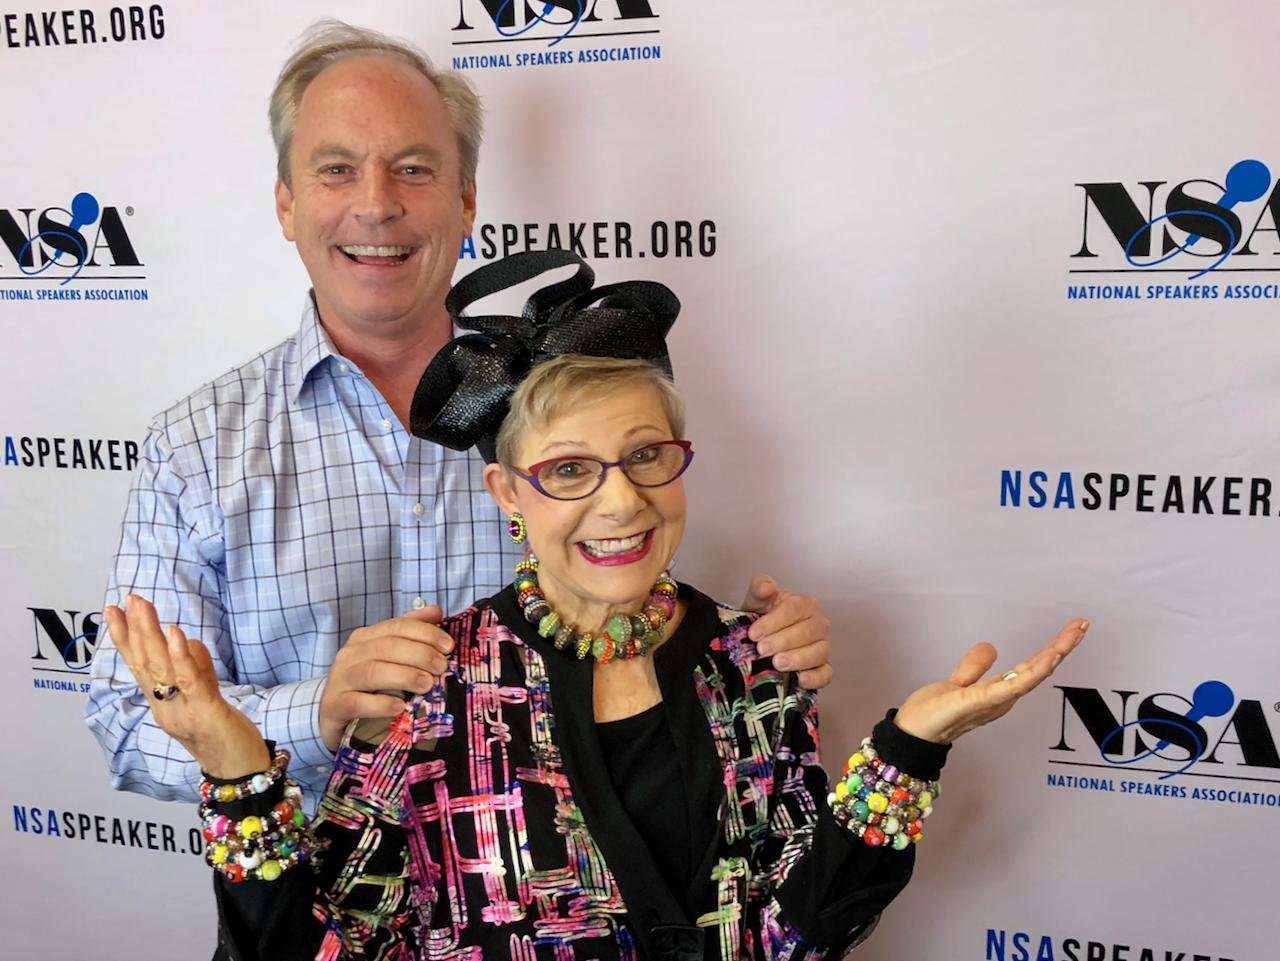 Patricia Fripp and Bob Phibbs